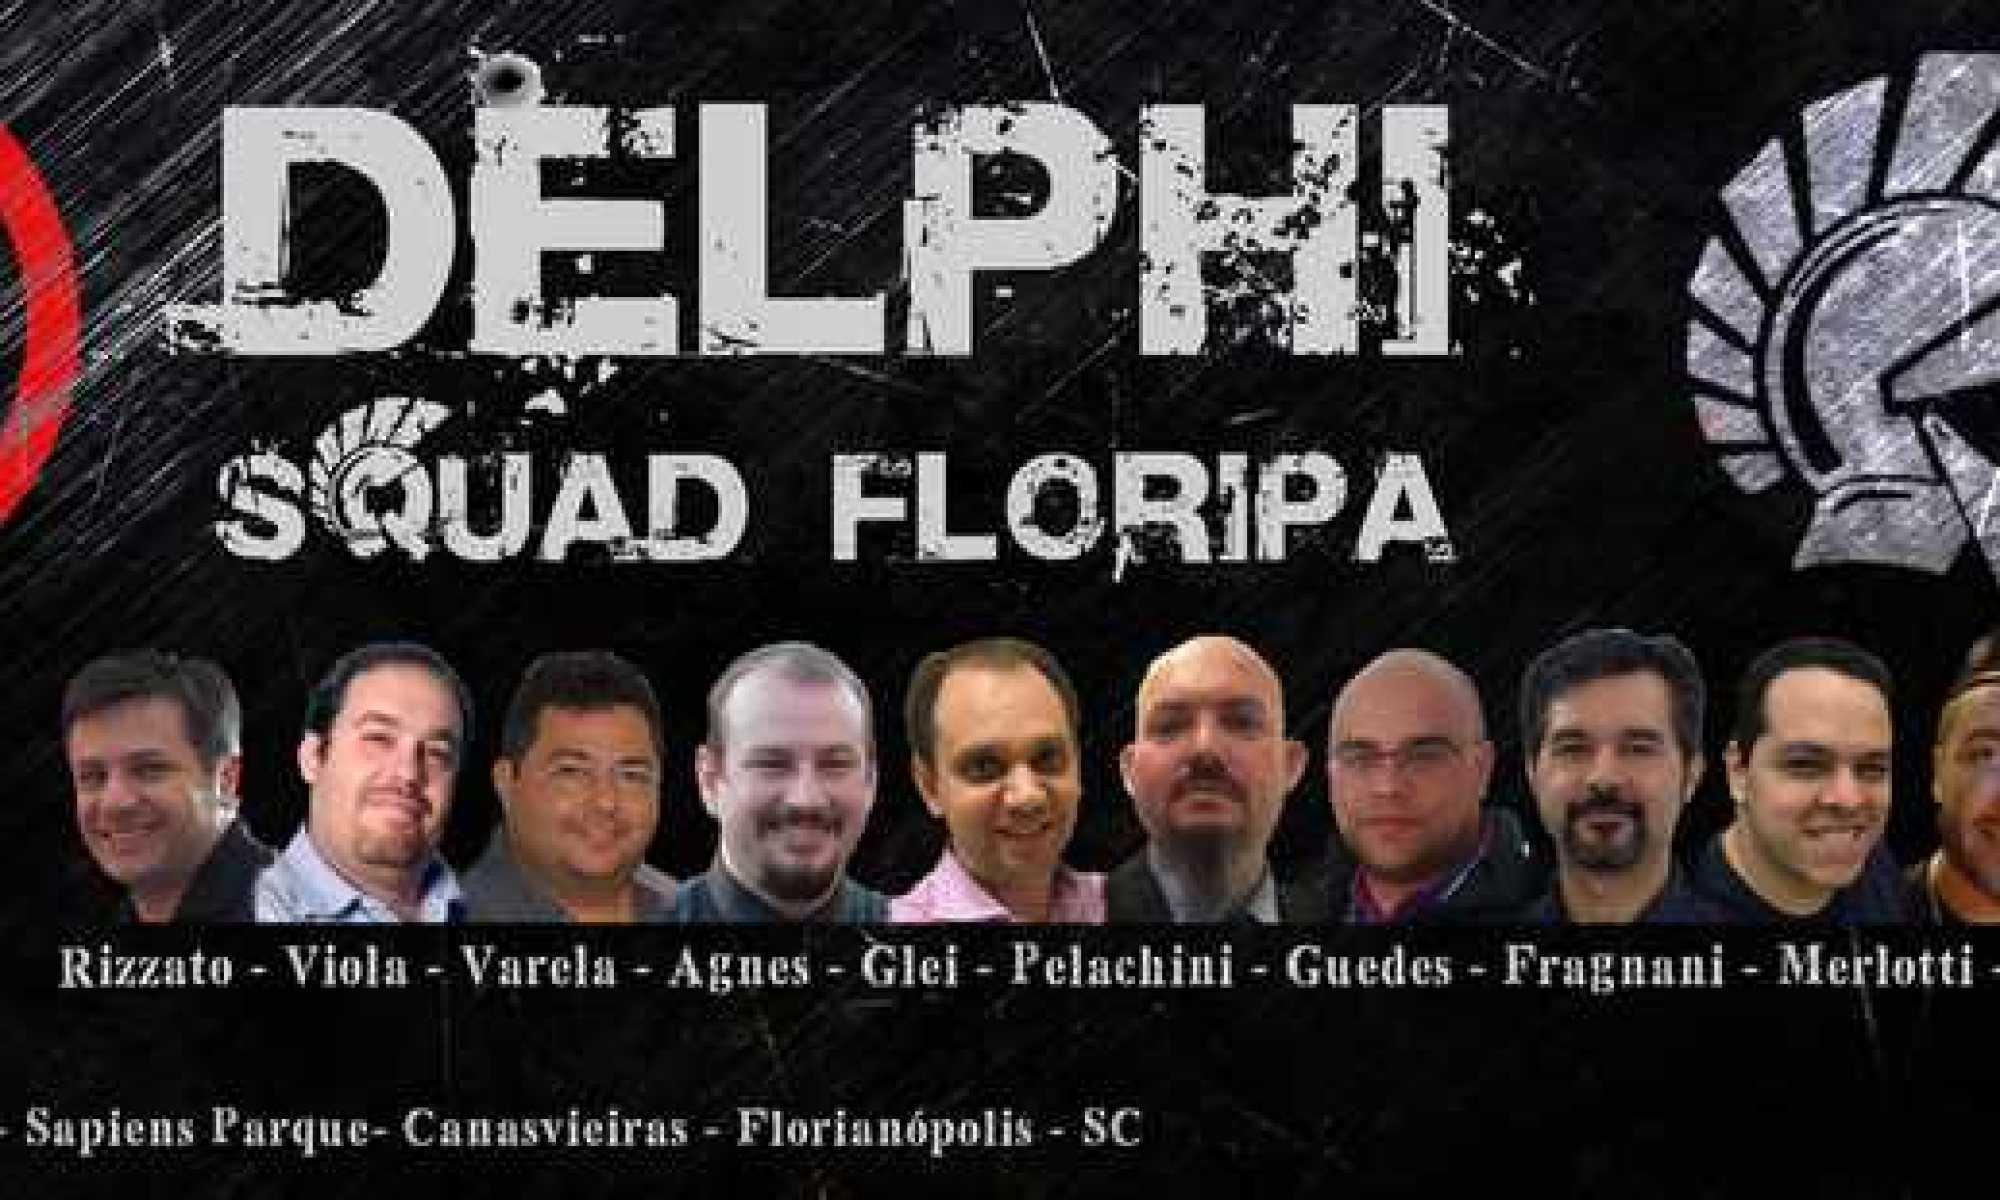 Squad Floripa 2017